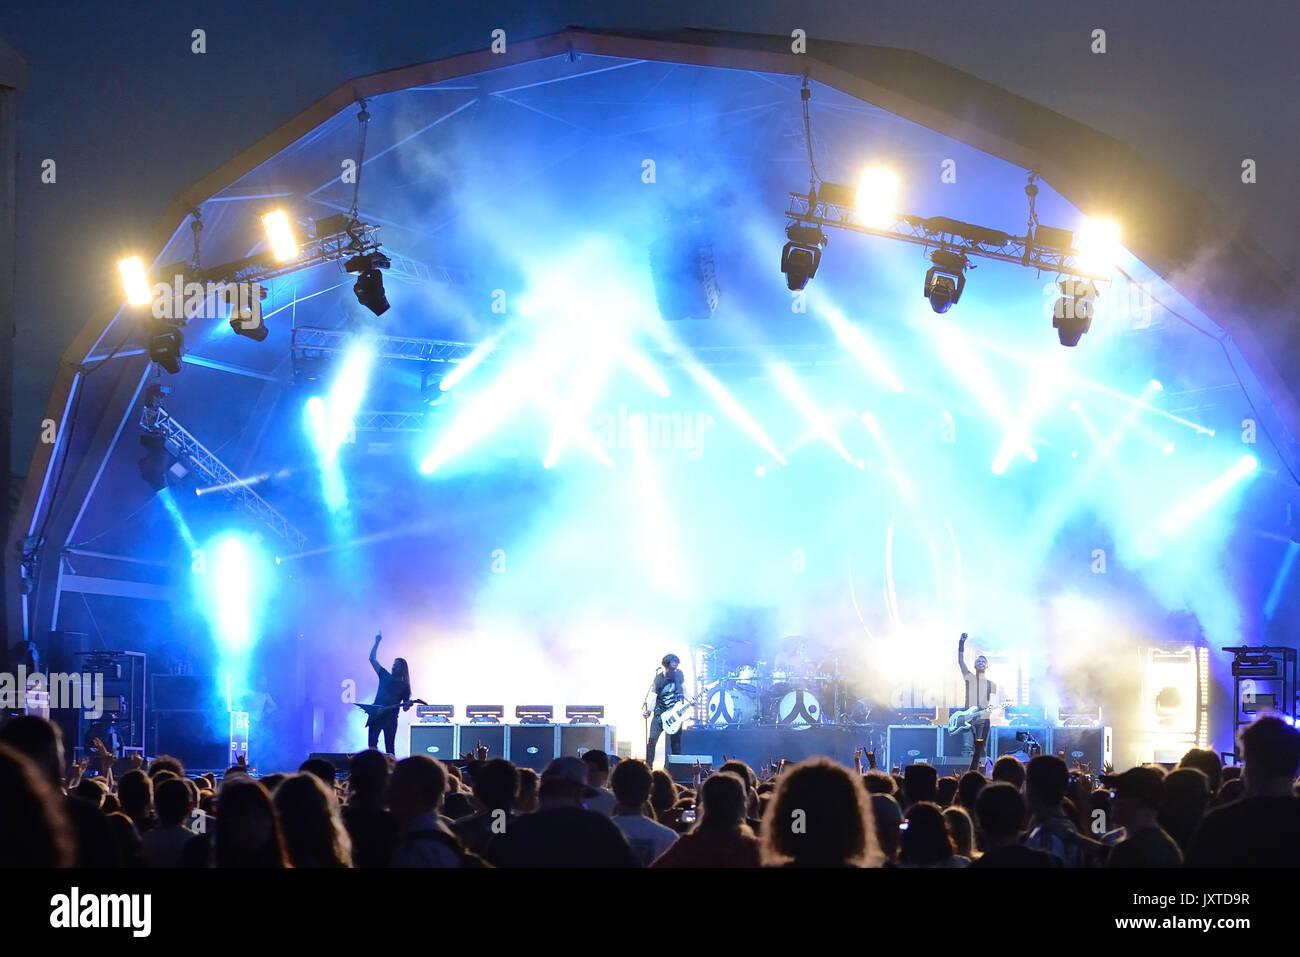 BARCELONA - JUN 1: Gojira (heavy metal music band) perform in concert at Primavera Sound 2017 Festival on June 1, 2017 in Barcelona, Spain. - Stock Image